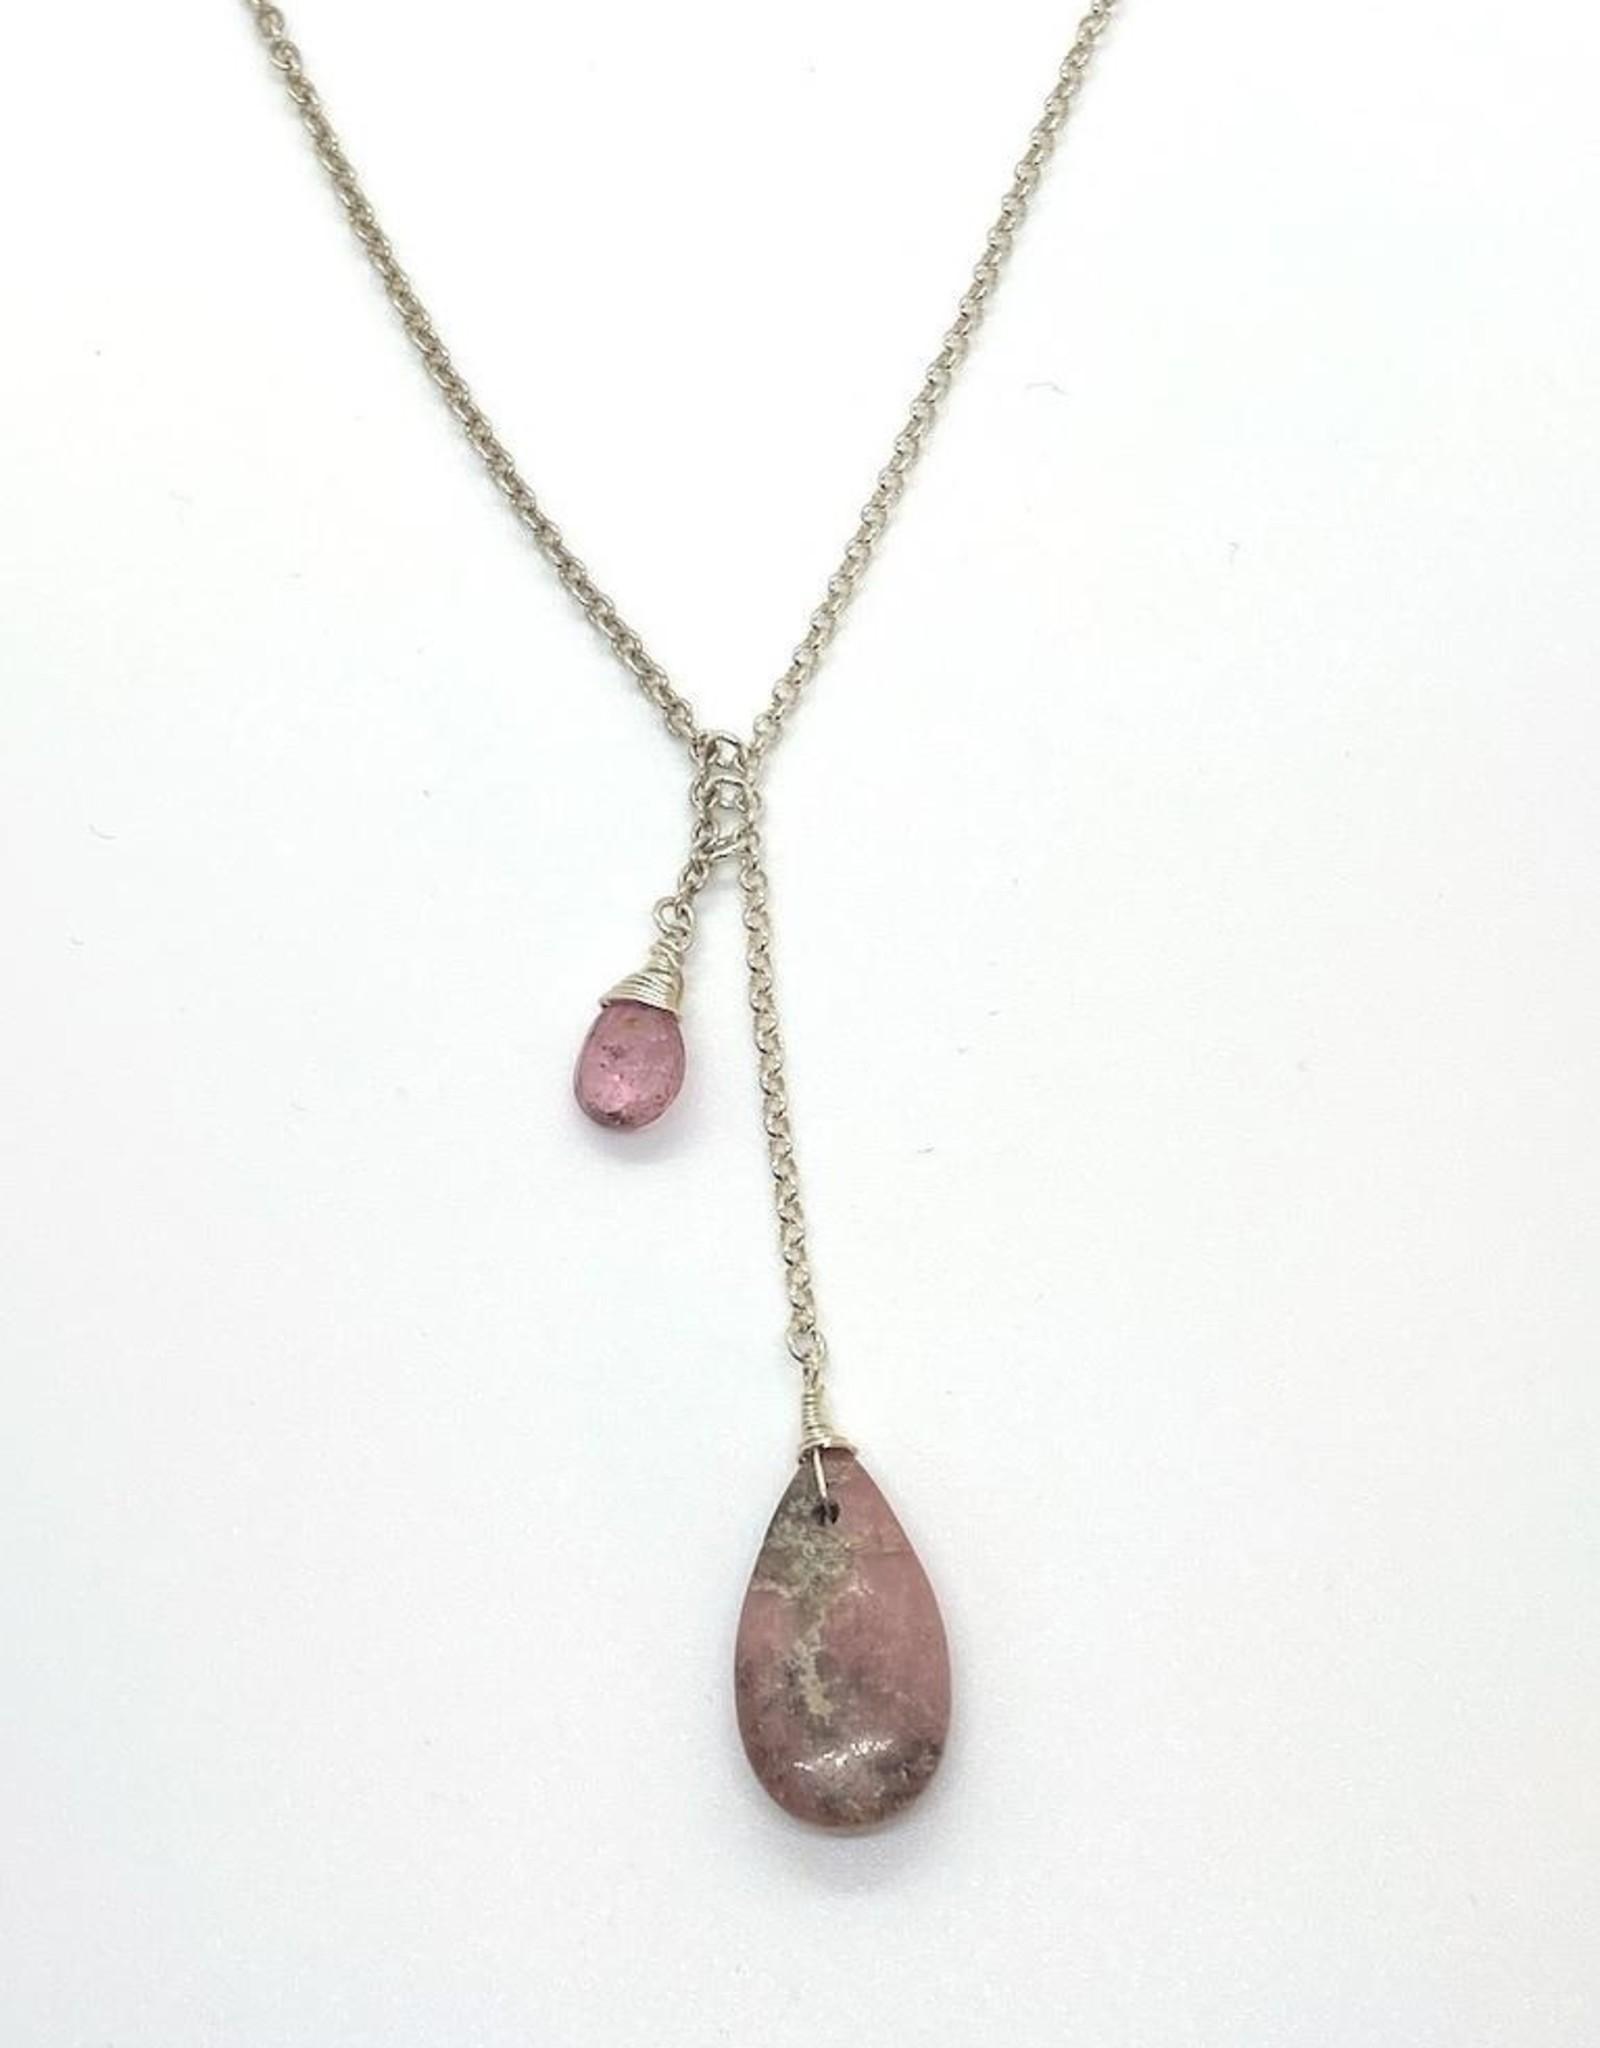 Handmade Silver Necklace with bolo: pink tourmaline briolette, rhodochrosite